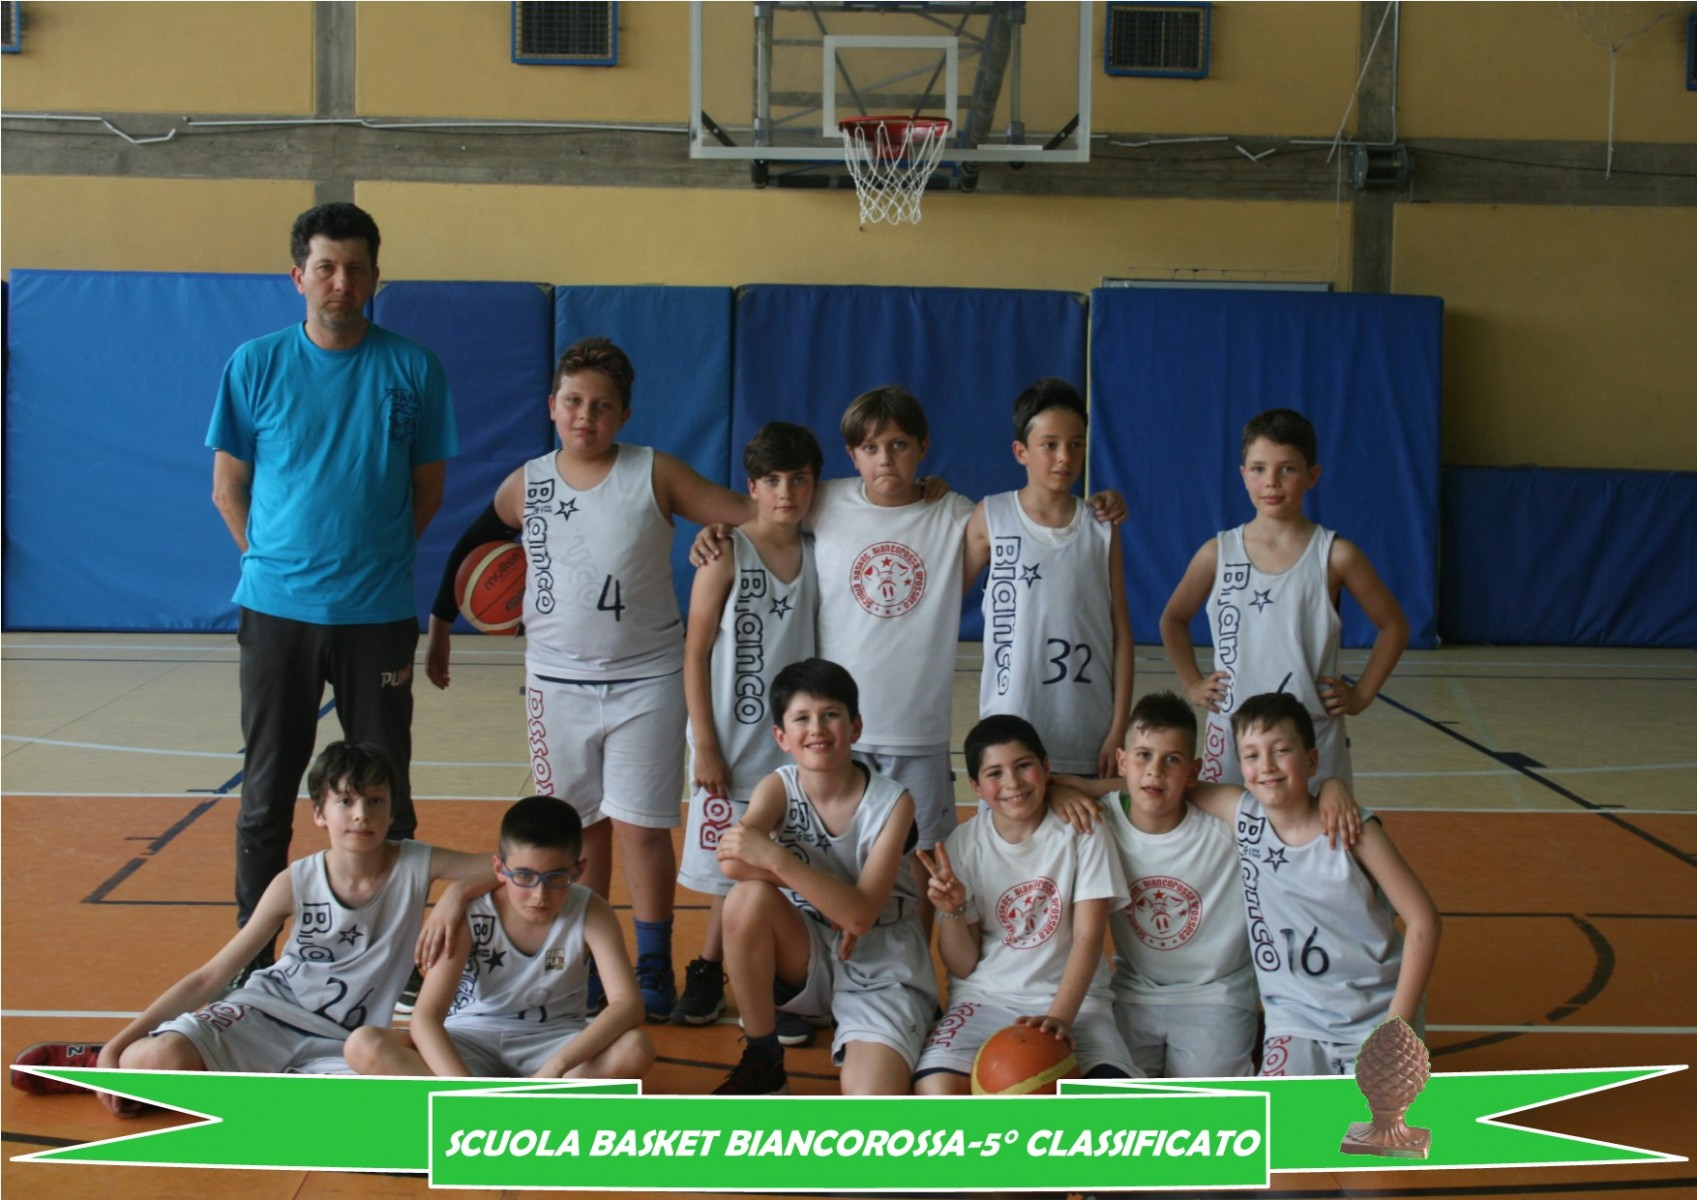 Scuola-Basket-Biancorossa